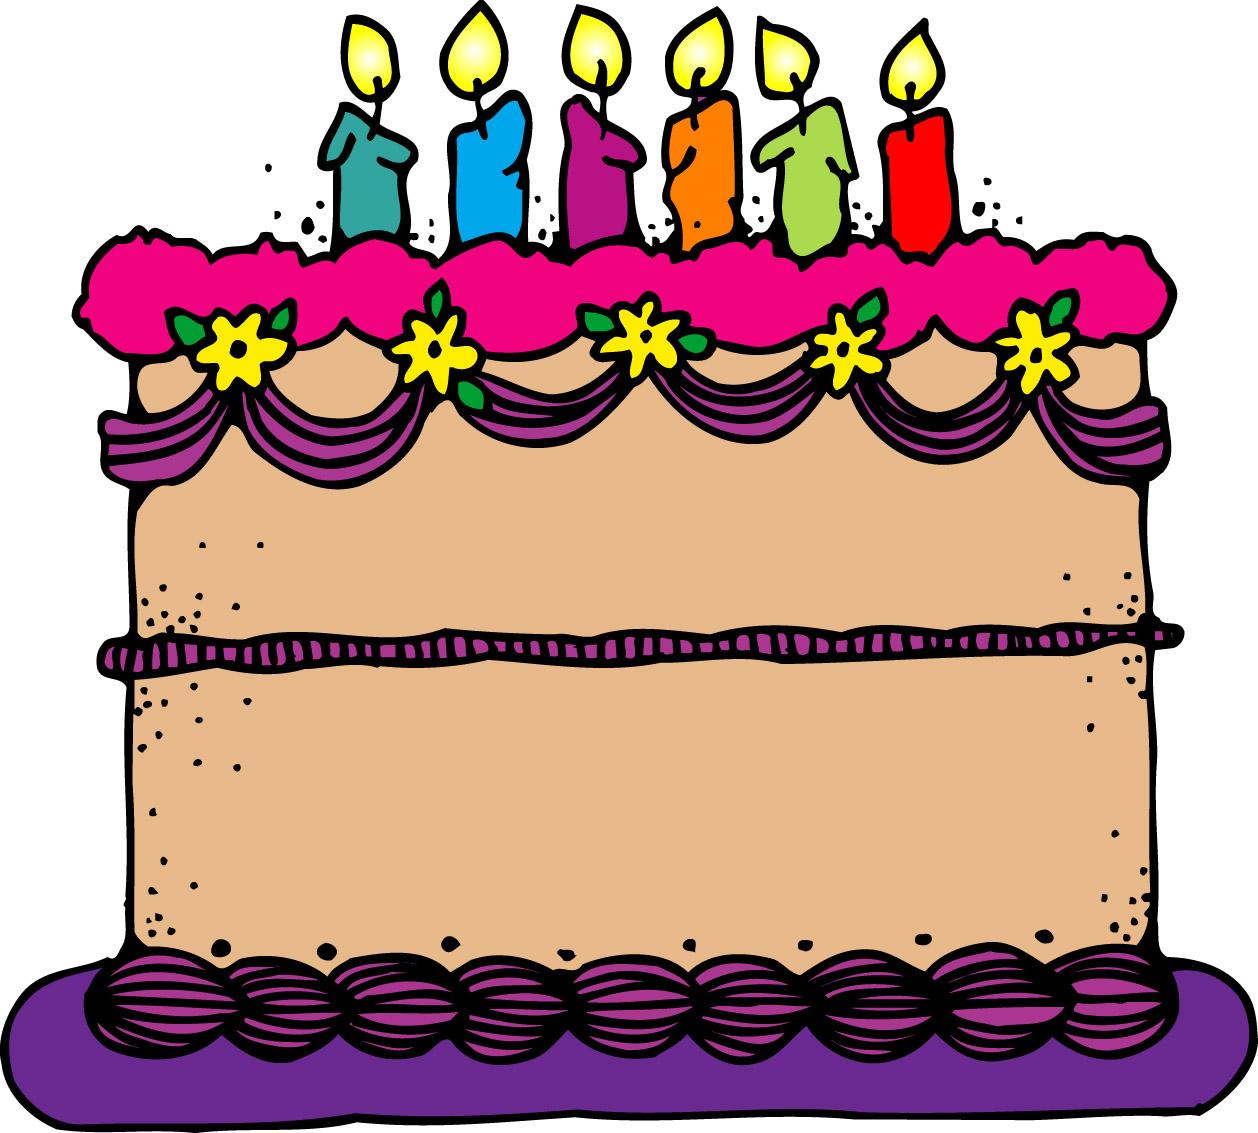 Birthday table clipart #2